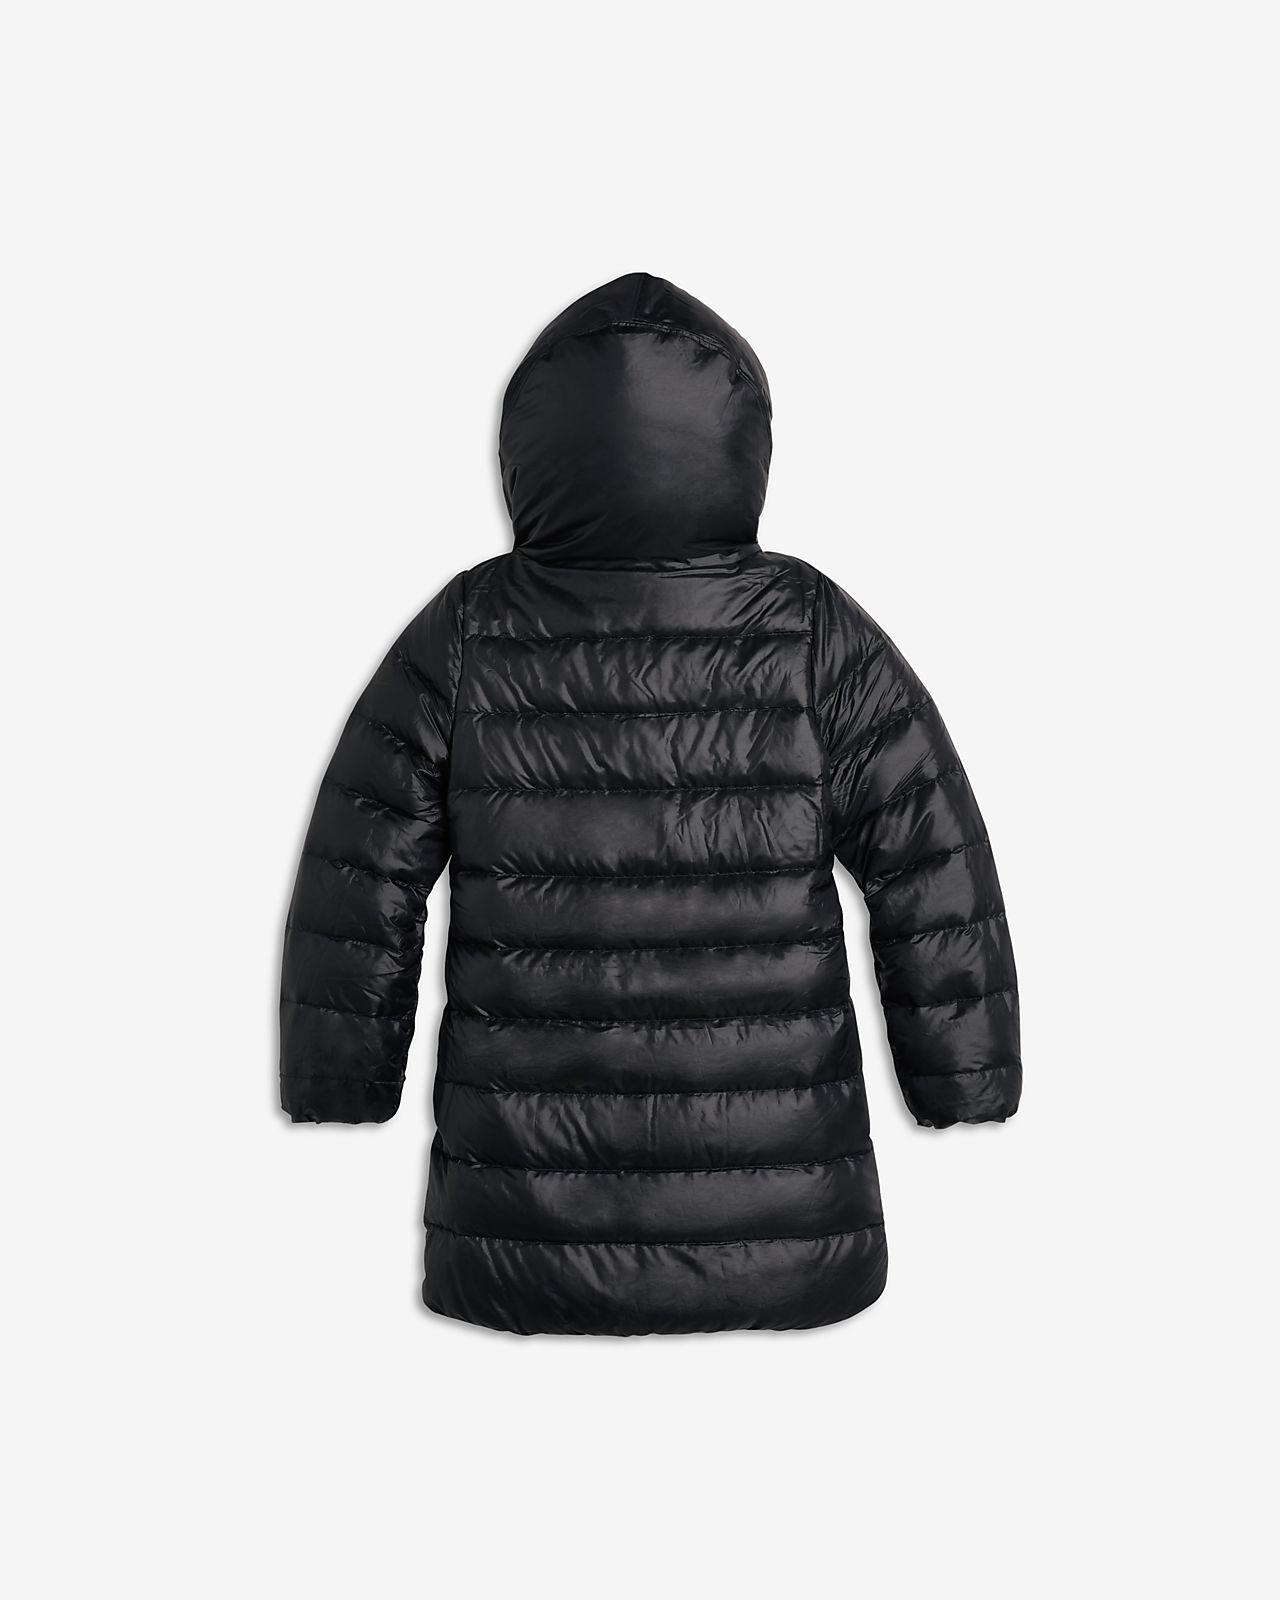 b425121ce Nike Sportswear Older Kids' (Girls') Down Jacket. Nike.com CA